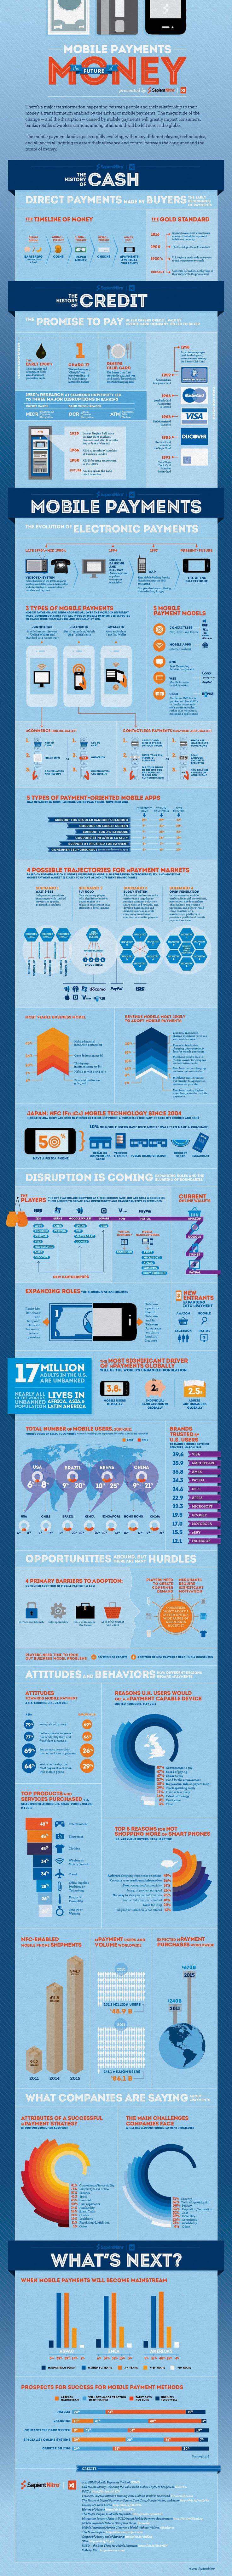 mobile-commerce-972